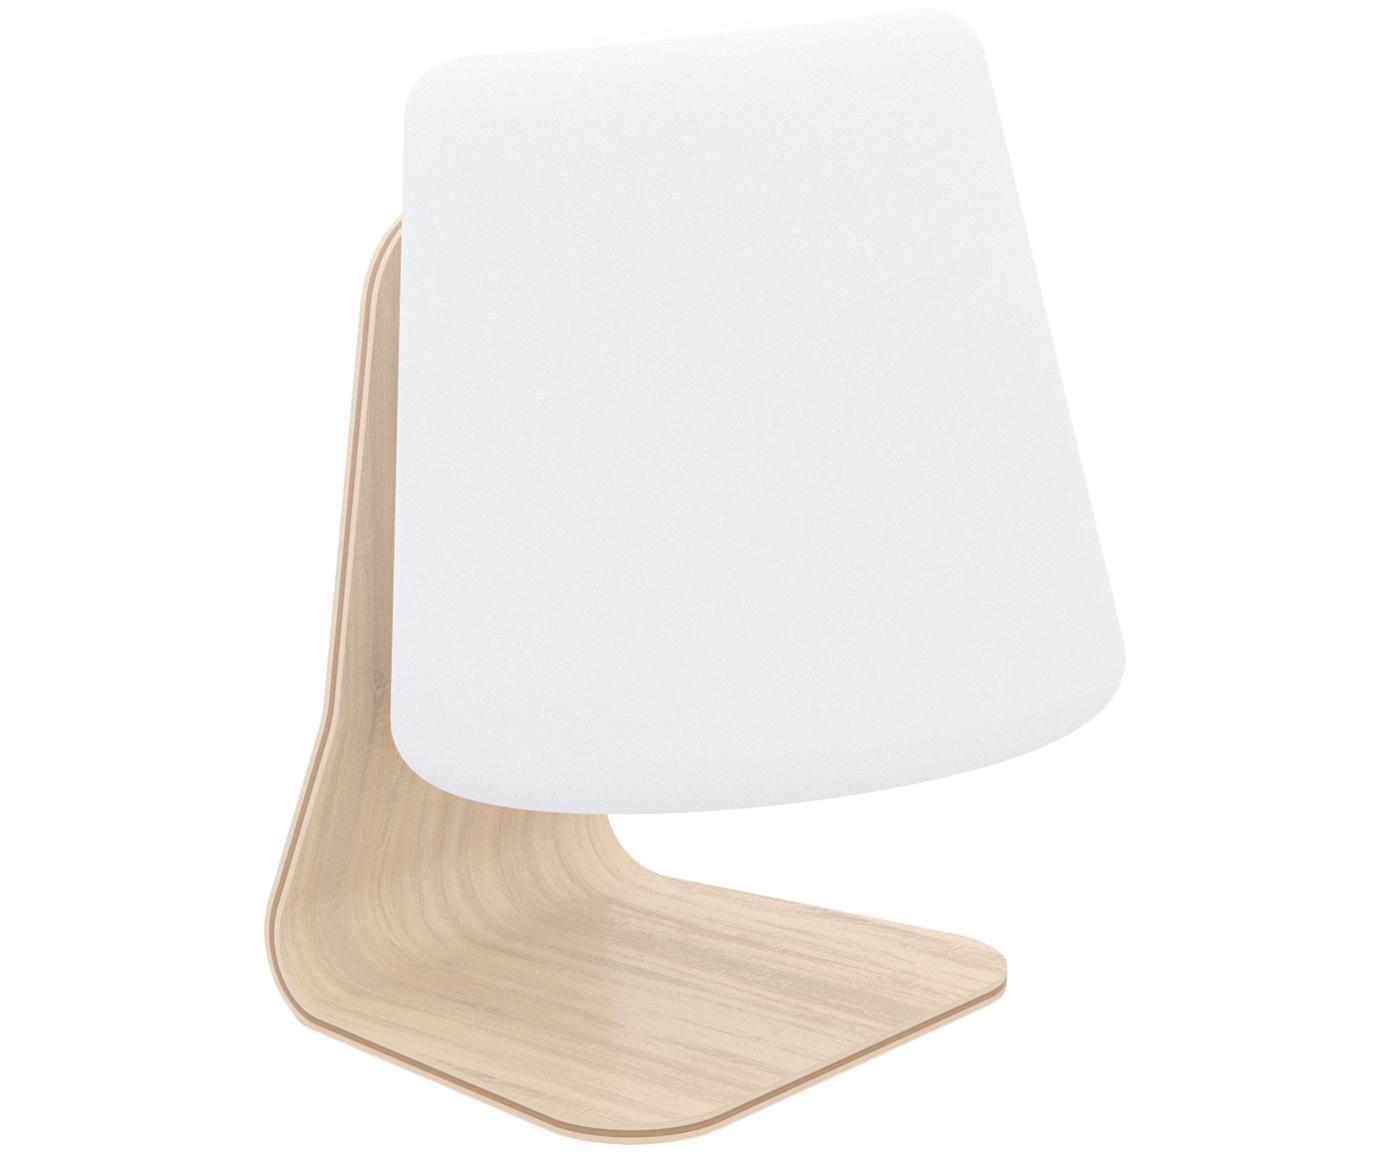 Lámpara LED de exterior Table, portátil, con altavoz, Pantalla: plástico, Blanco, beige, An 22 x Al 29 cm